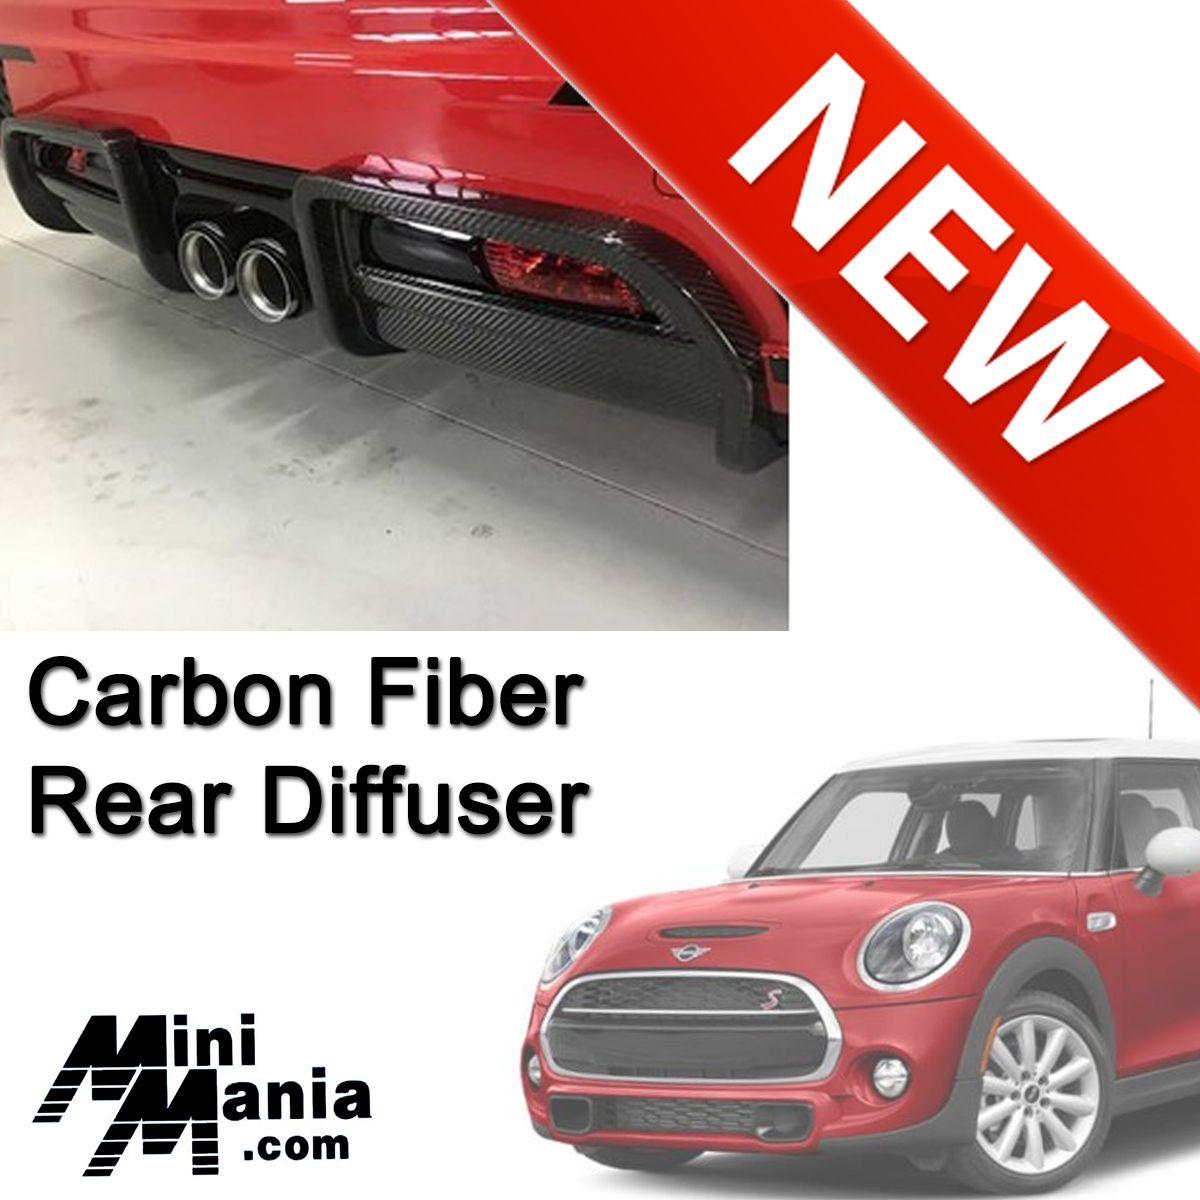 Mini Cooper Jcw Pro Carbon Fiber Rear Diffuser Cover Gen3 F56 Mini Cooper Carbon Fiber Mini Cooper S